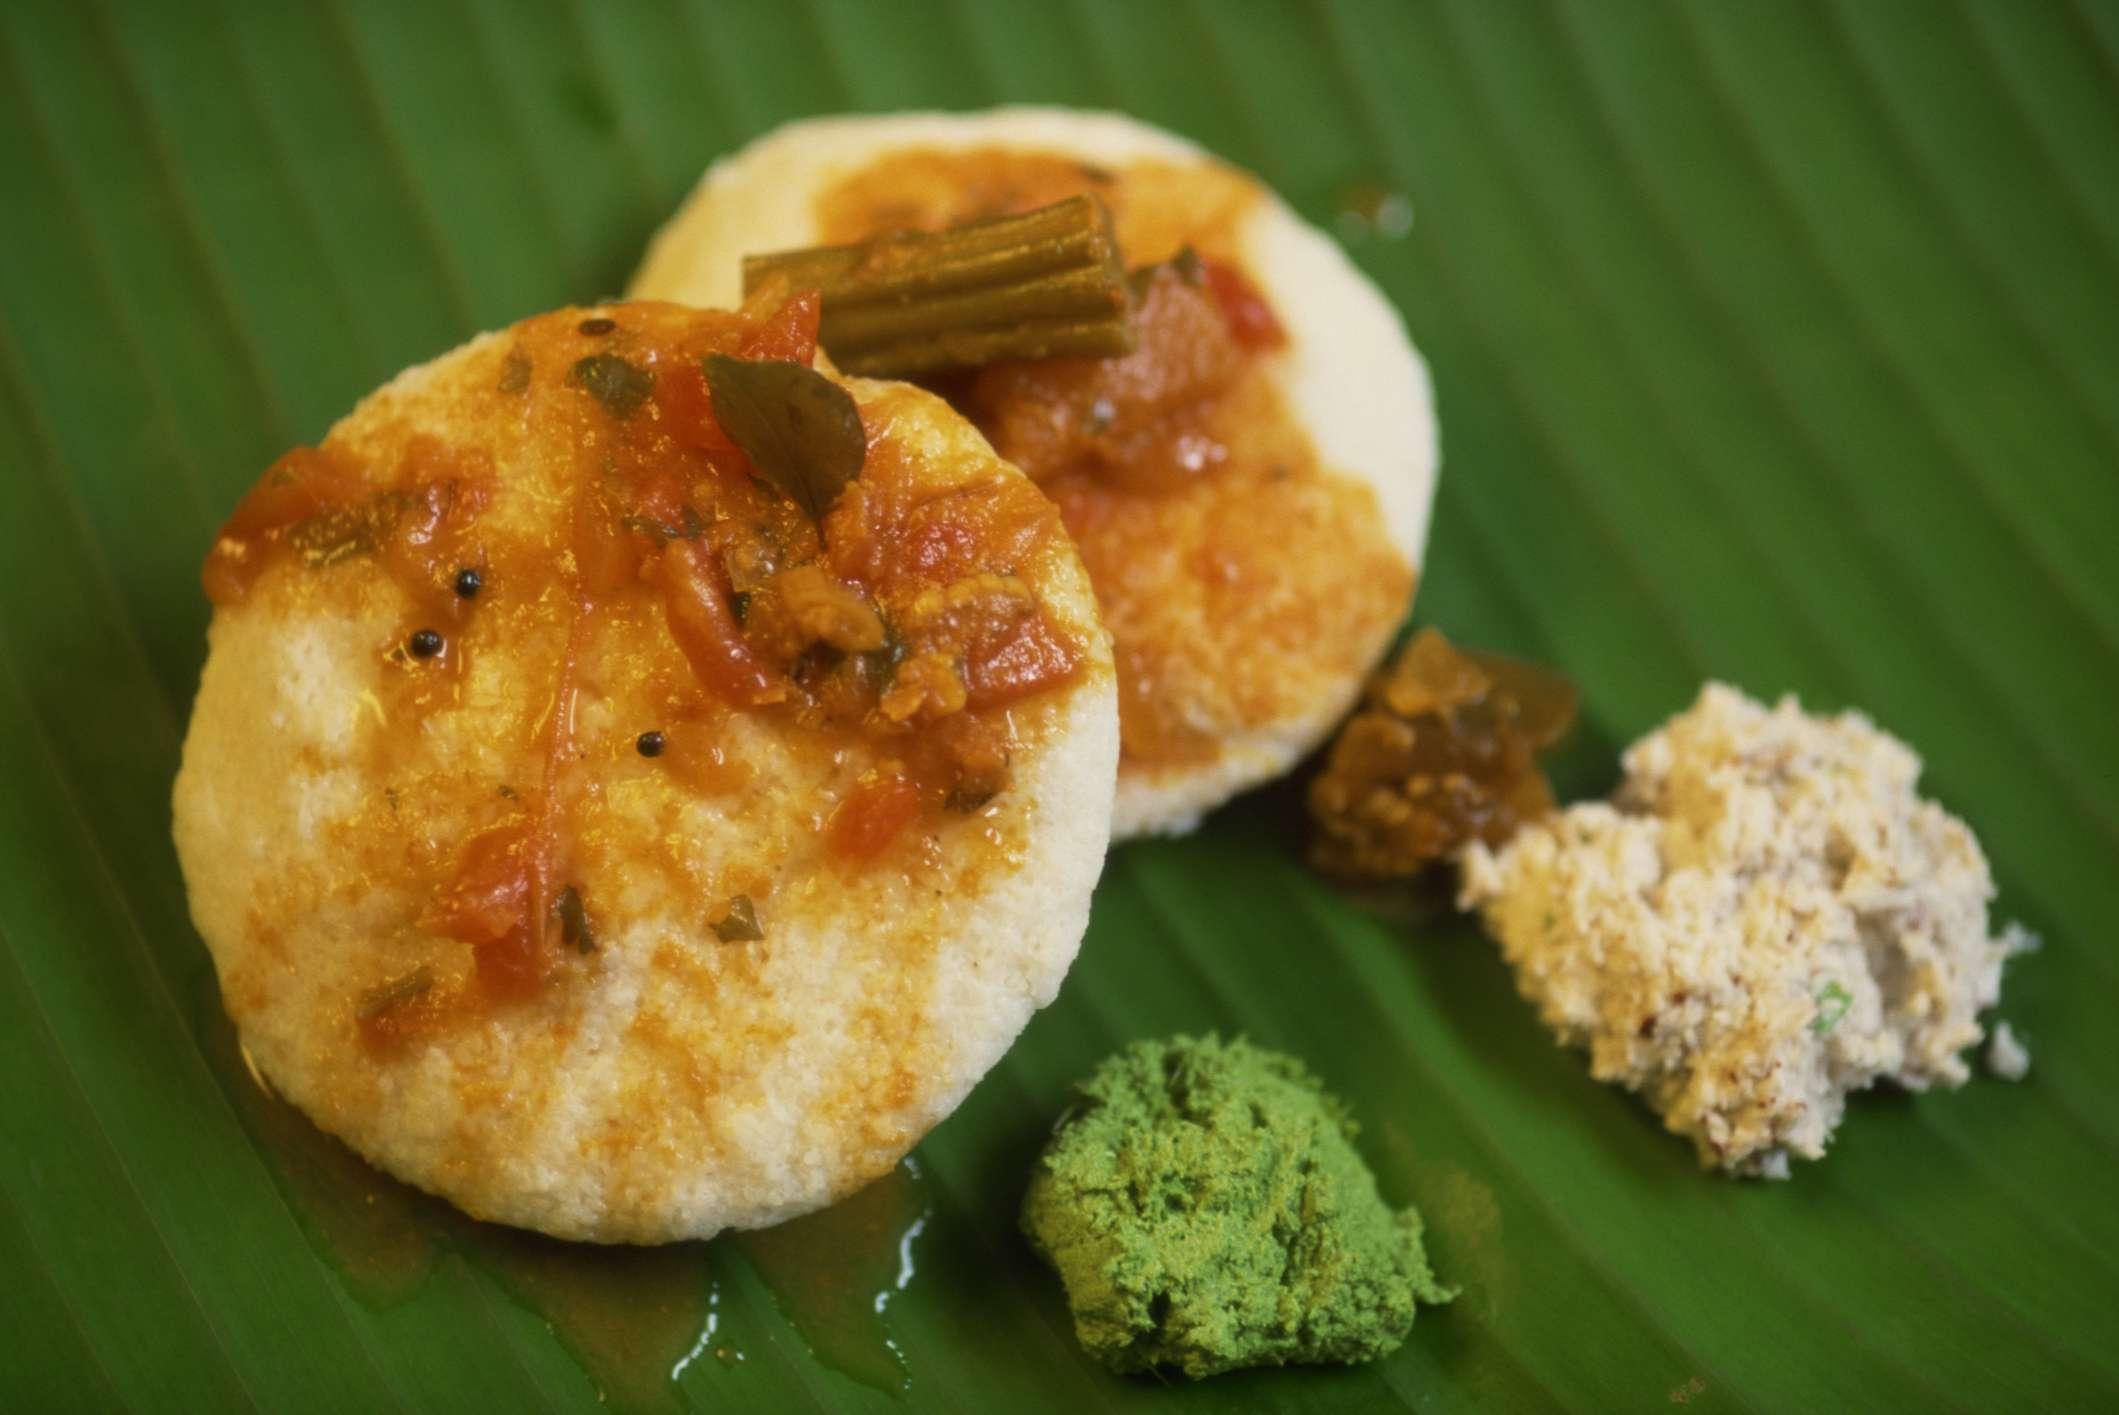 Idli with sambar and chutney